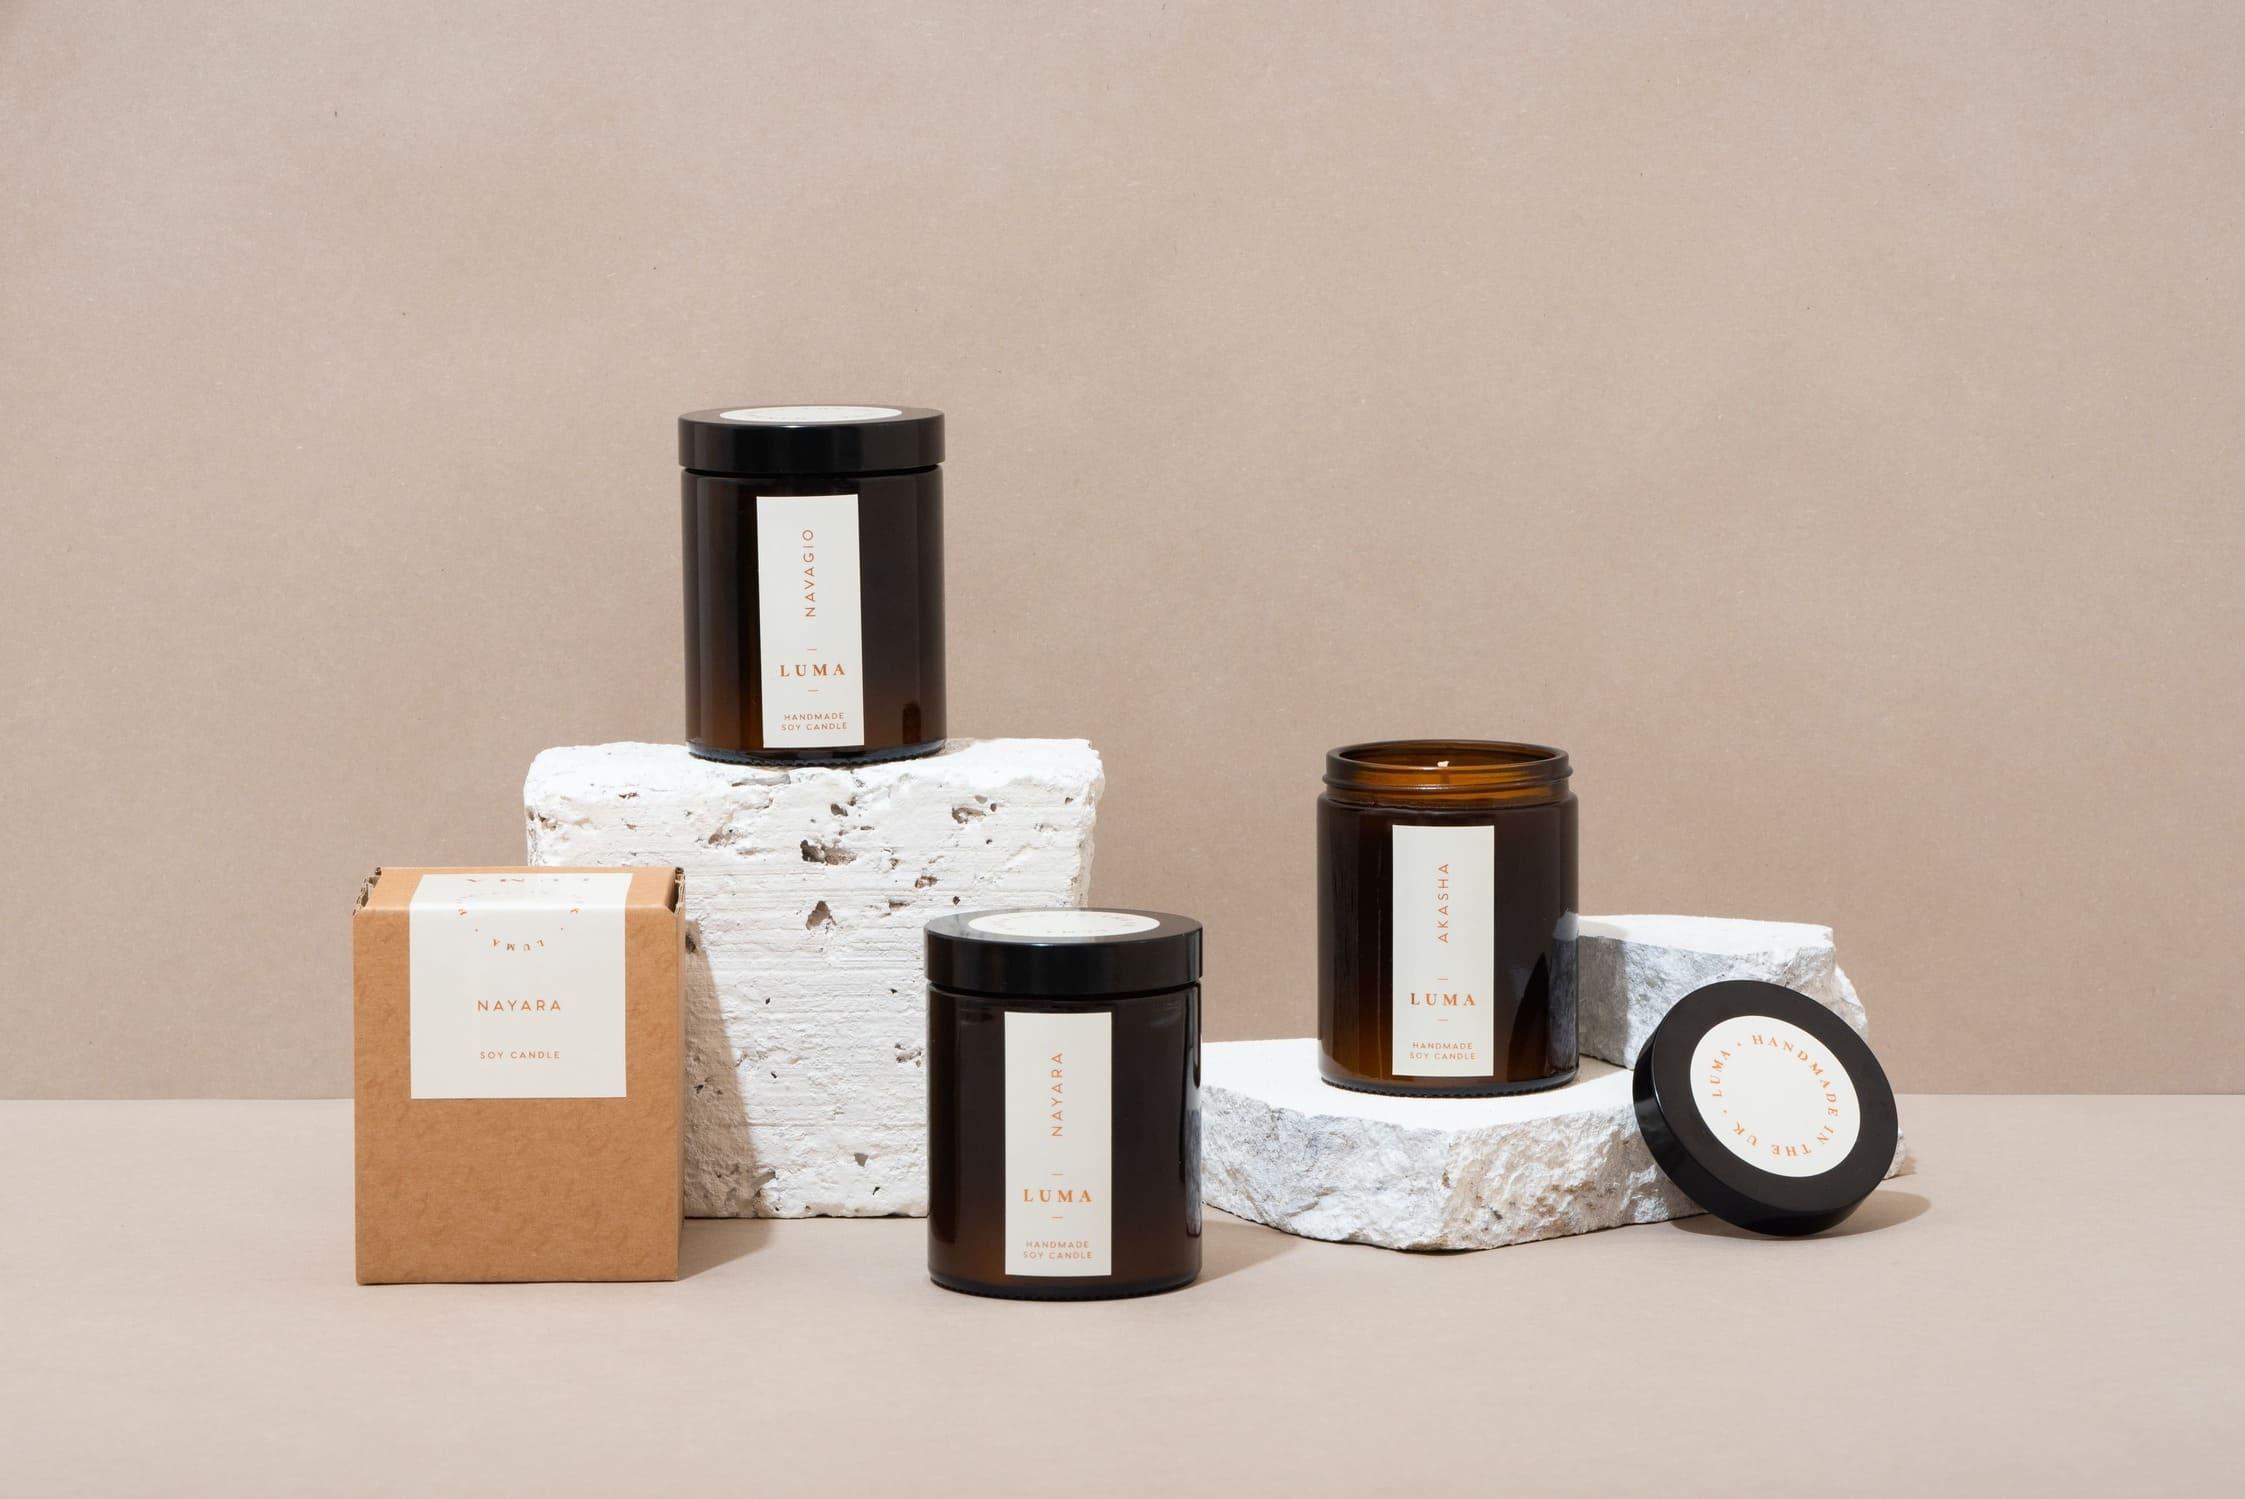 il-valore-del-packaging-fraancesca-barabgallo